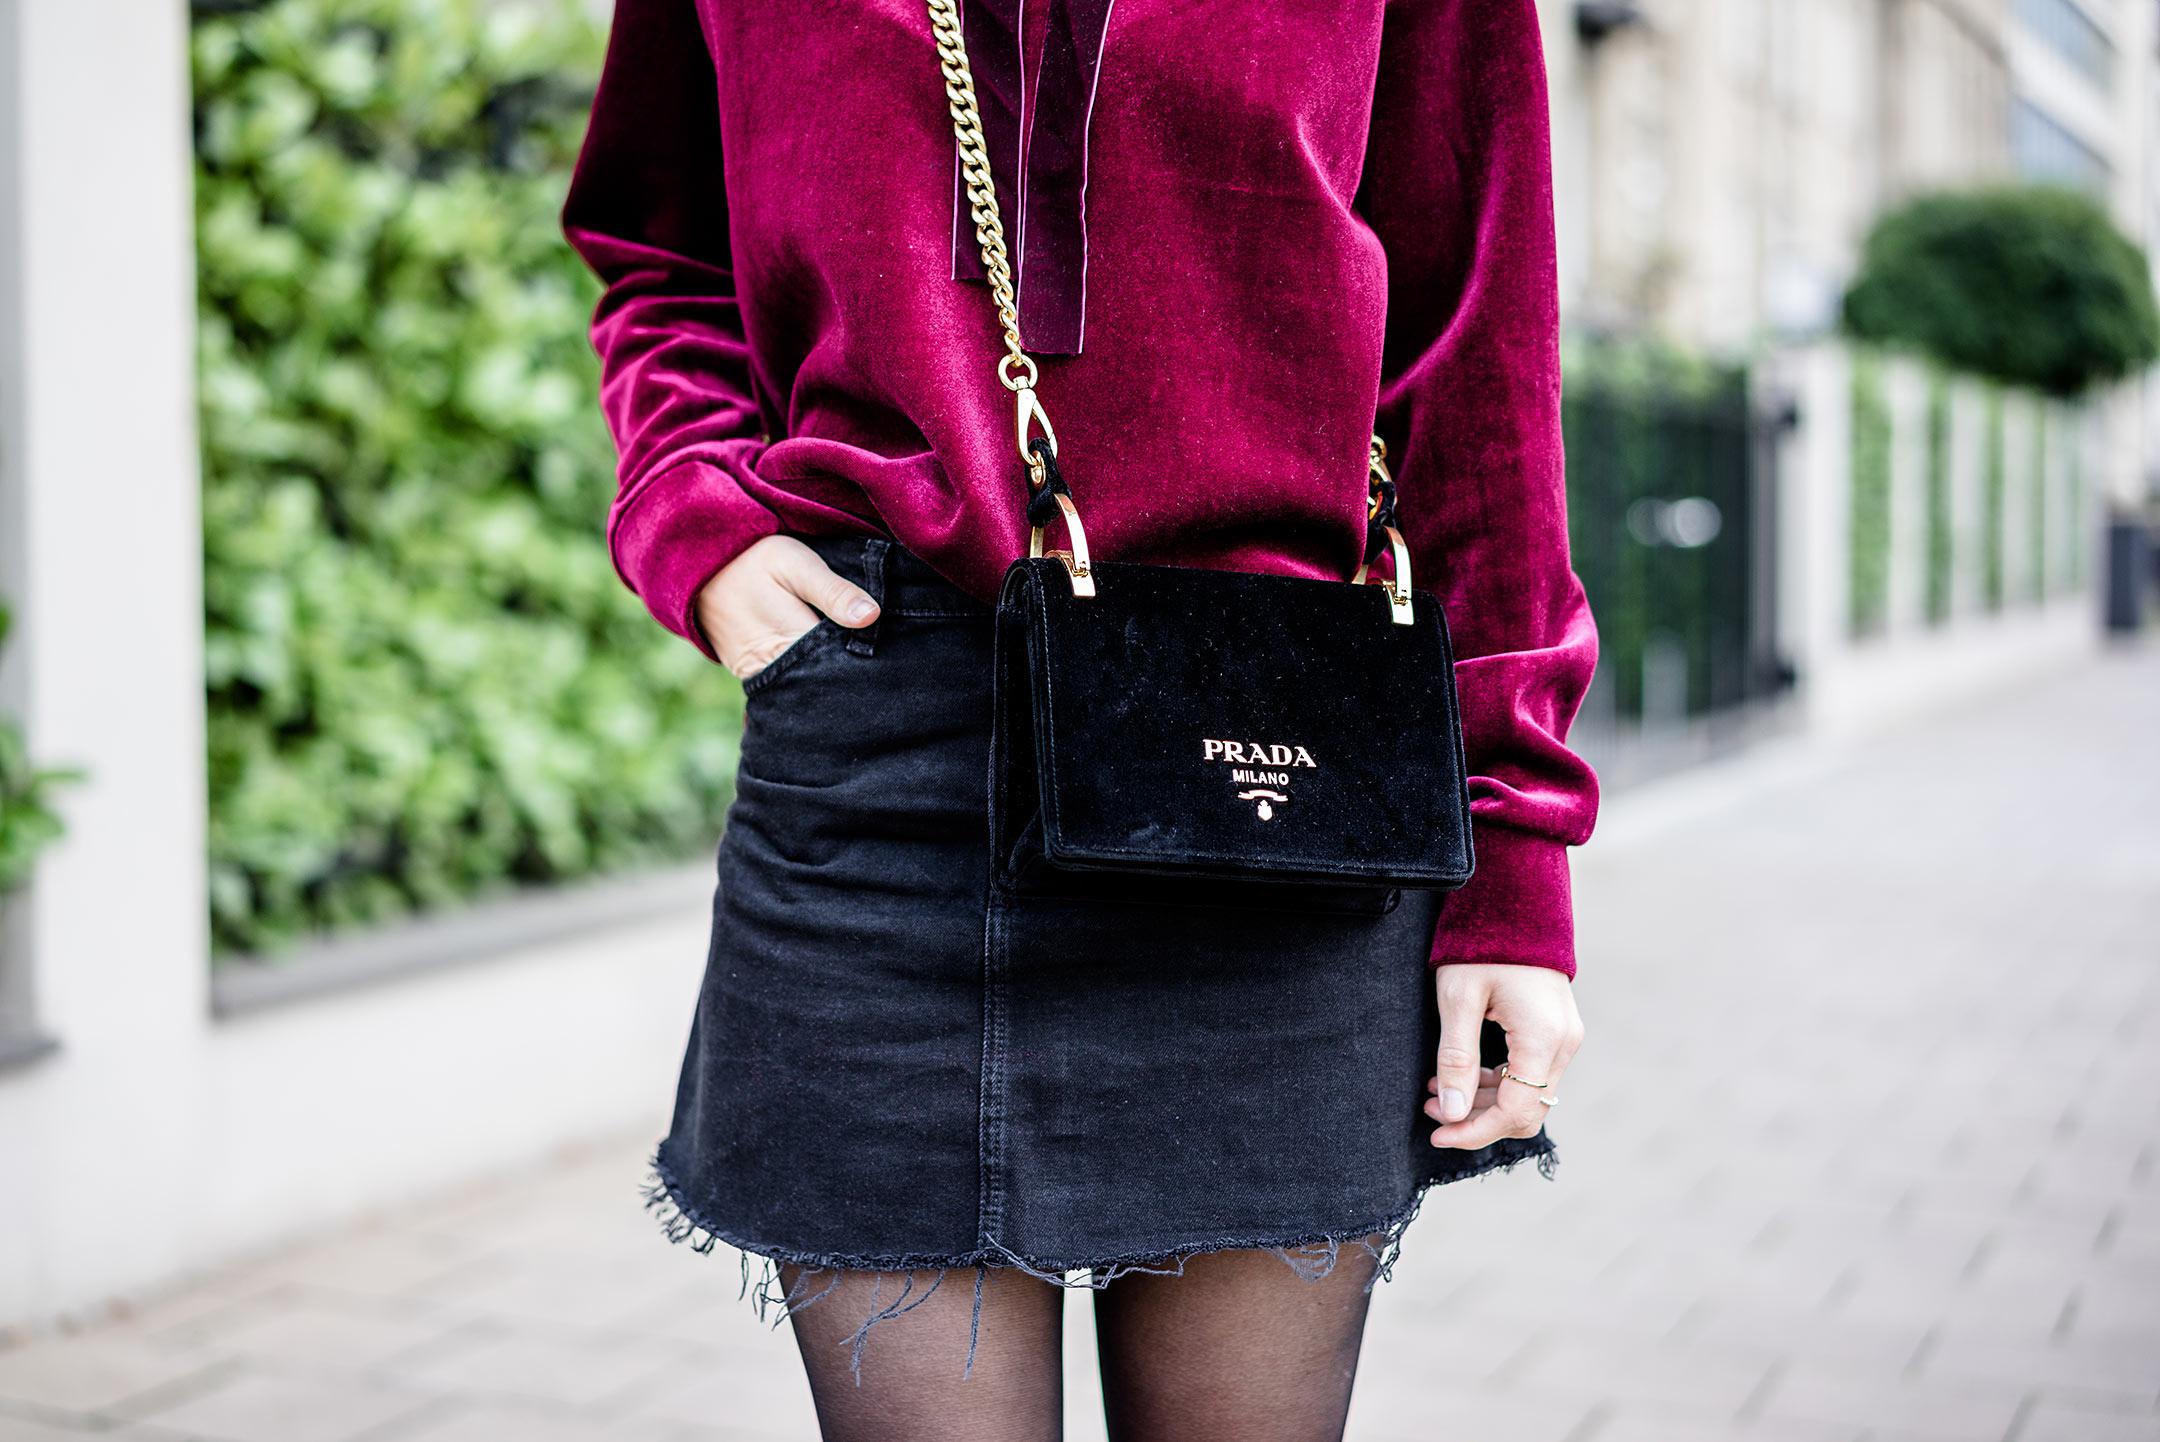 Prada Velvet Shoulder Bag Nero Samt Designer Handtasche schwarz Sunnyinga